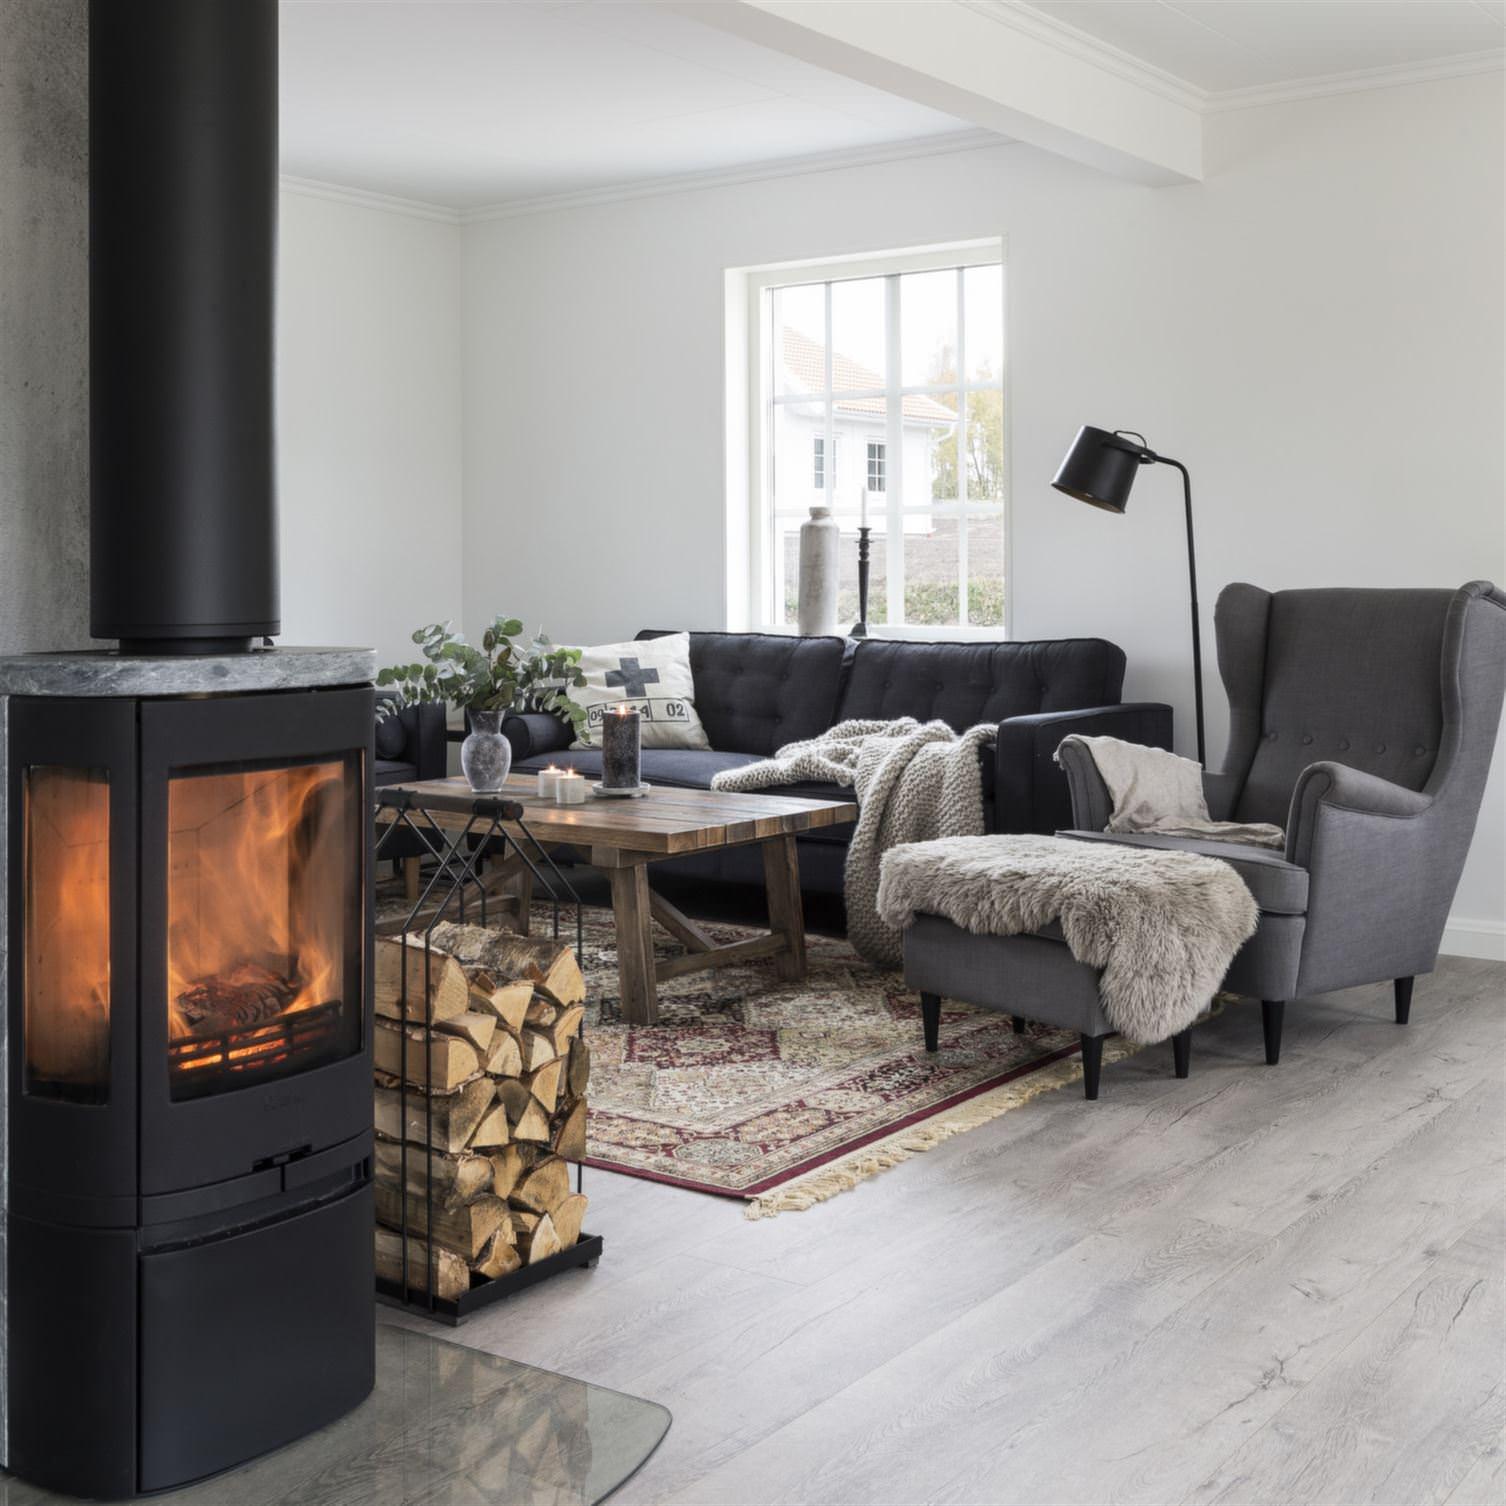 poltrona strandmon vogliacasavogliacasa. Black Bedroom Furniture Sets. Home Design Ideas